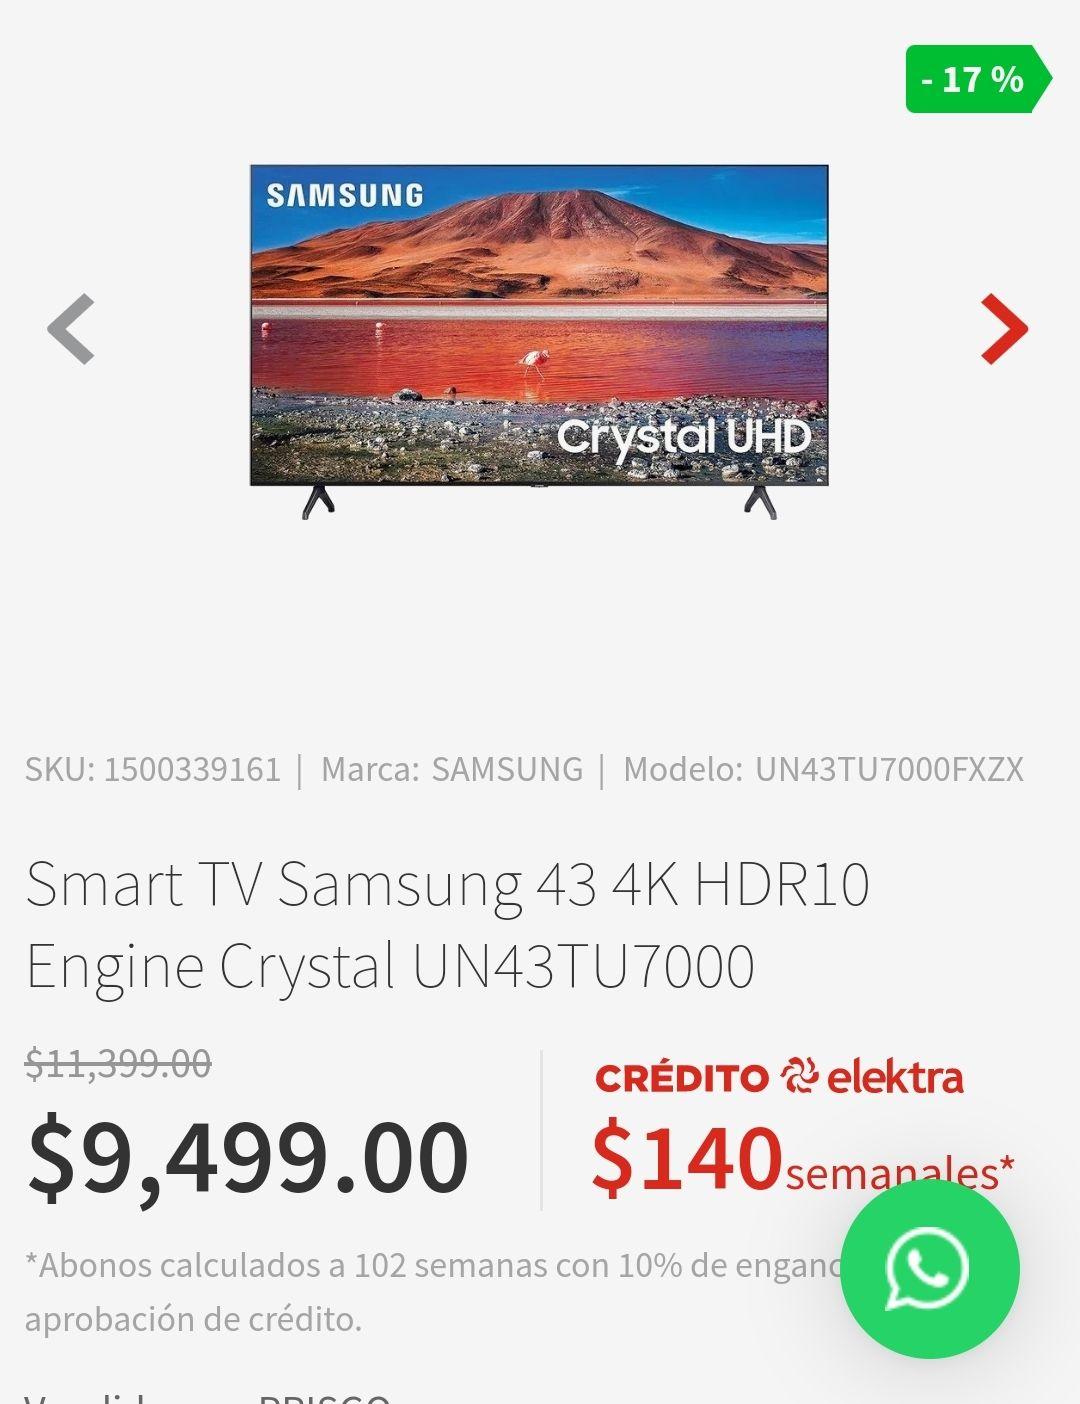 Elektra: Smart TV Samsung 43 4K HDR10 Engine Crystal UN43TU7000